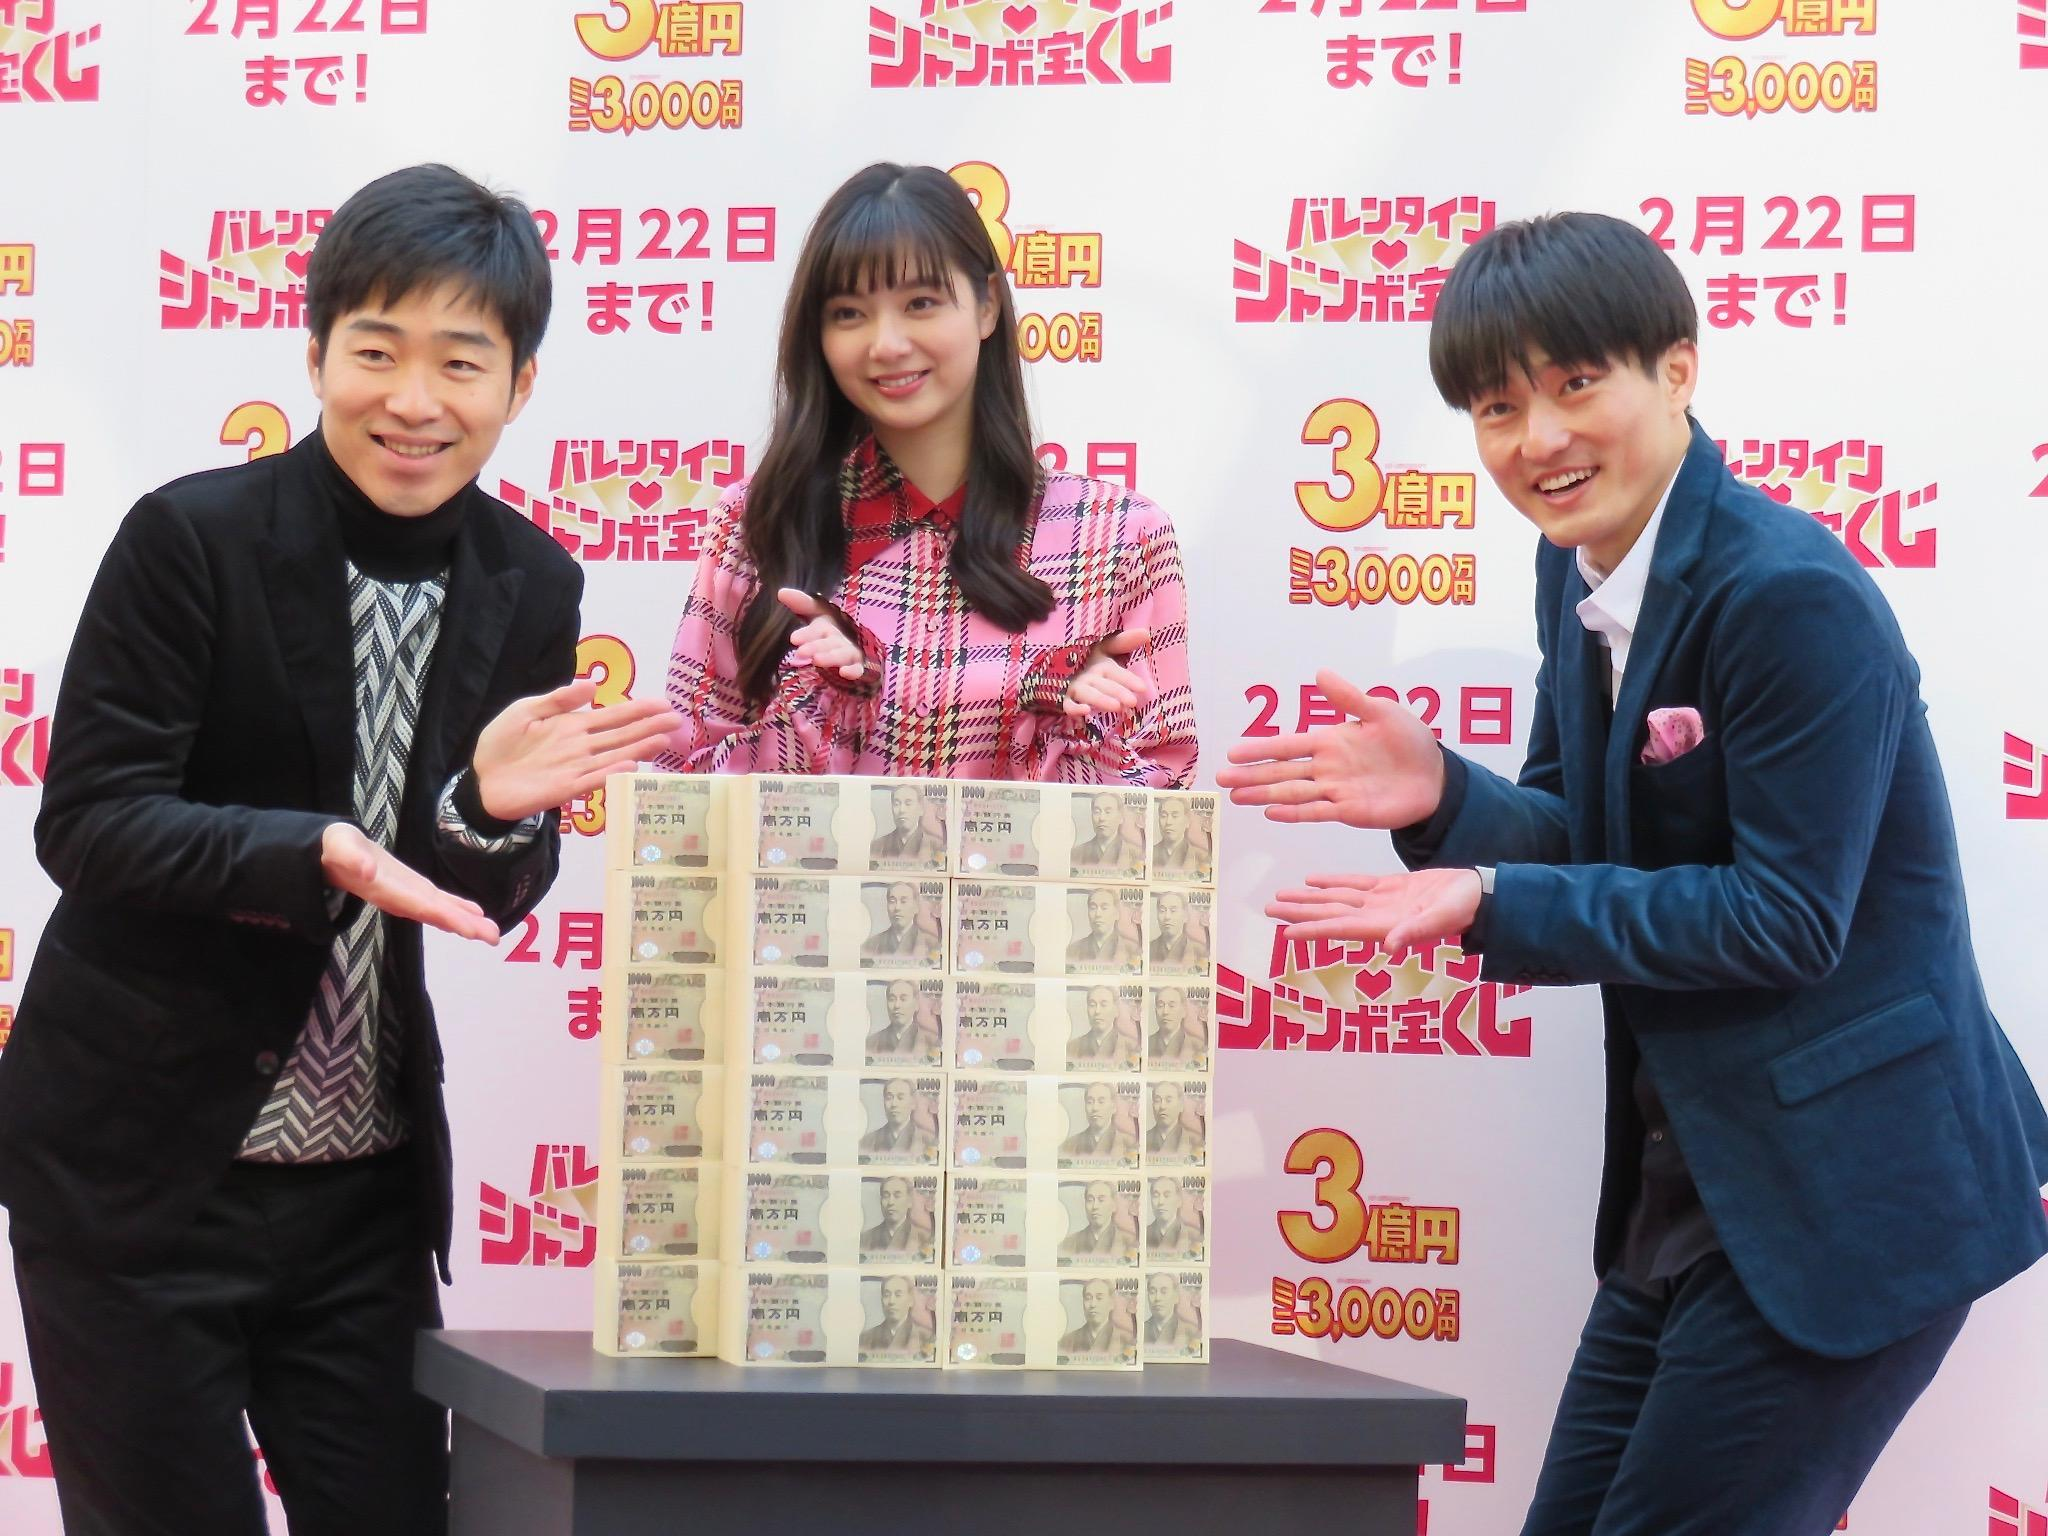 http://news.yoshimoto.co.jp/20190130164700-d0339e9598fbaa87b64954fe842f105d4a876805.jpeg